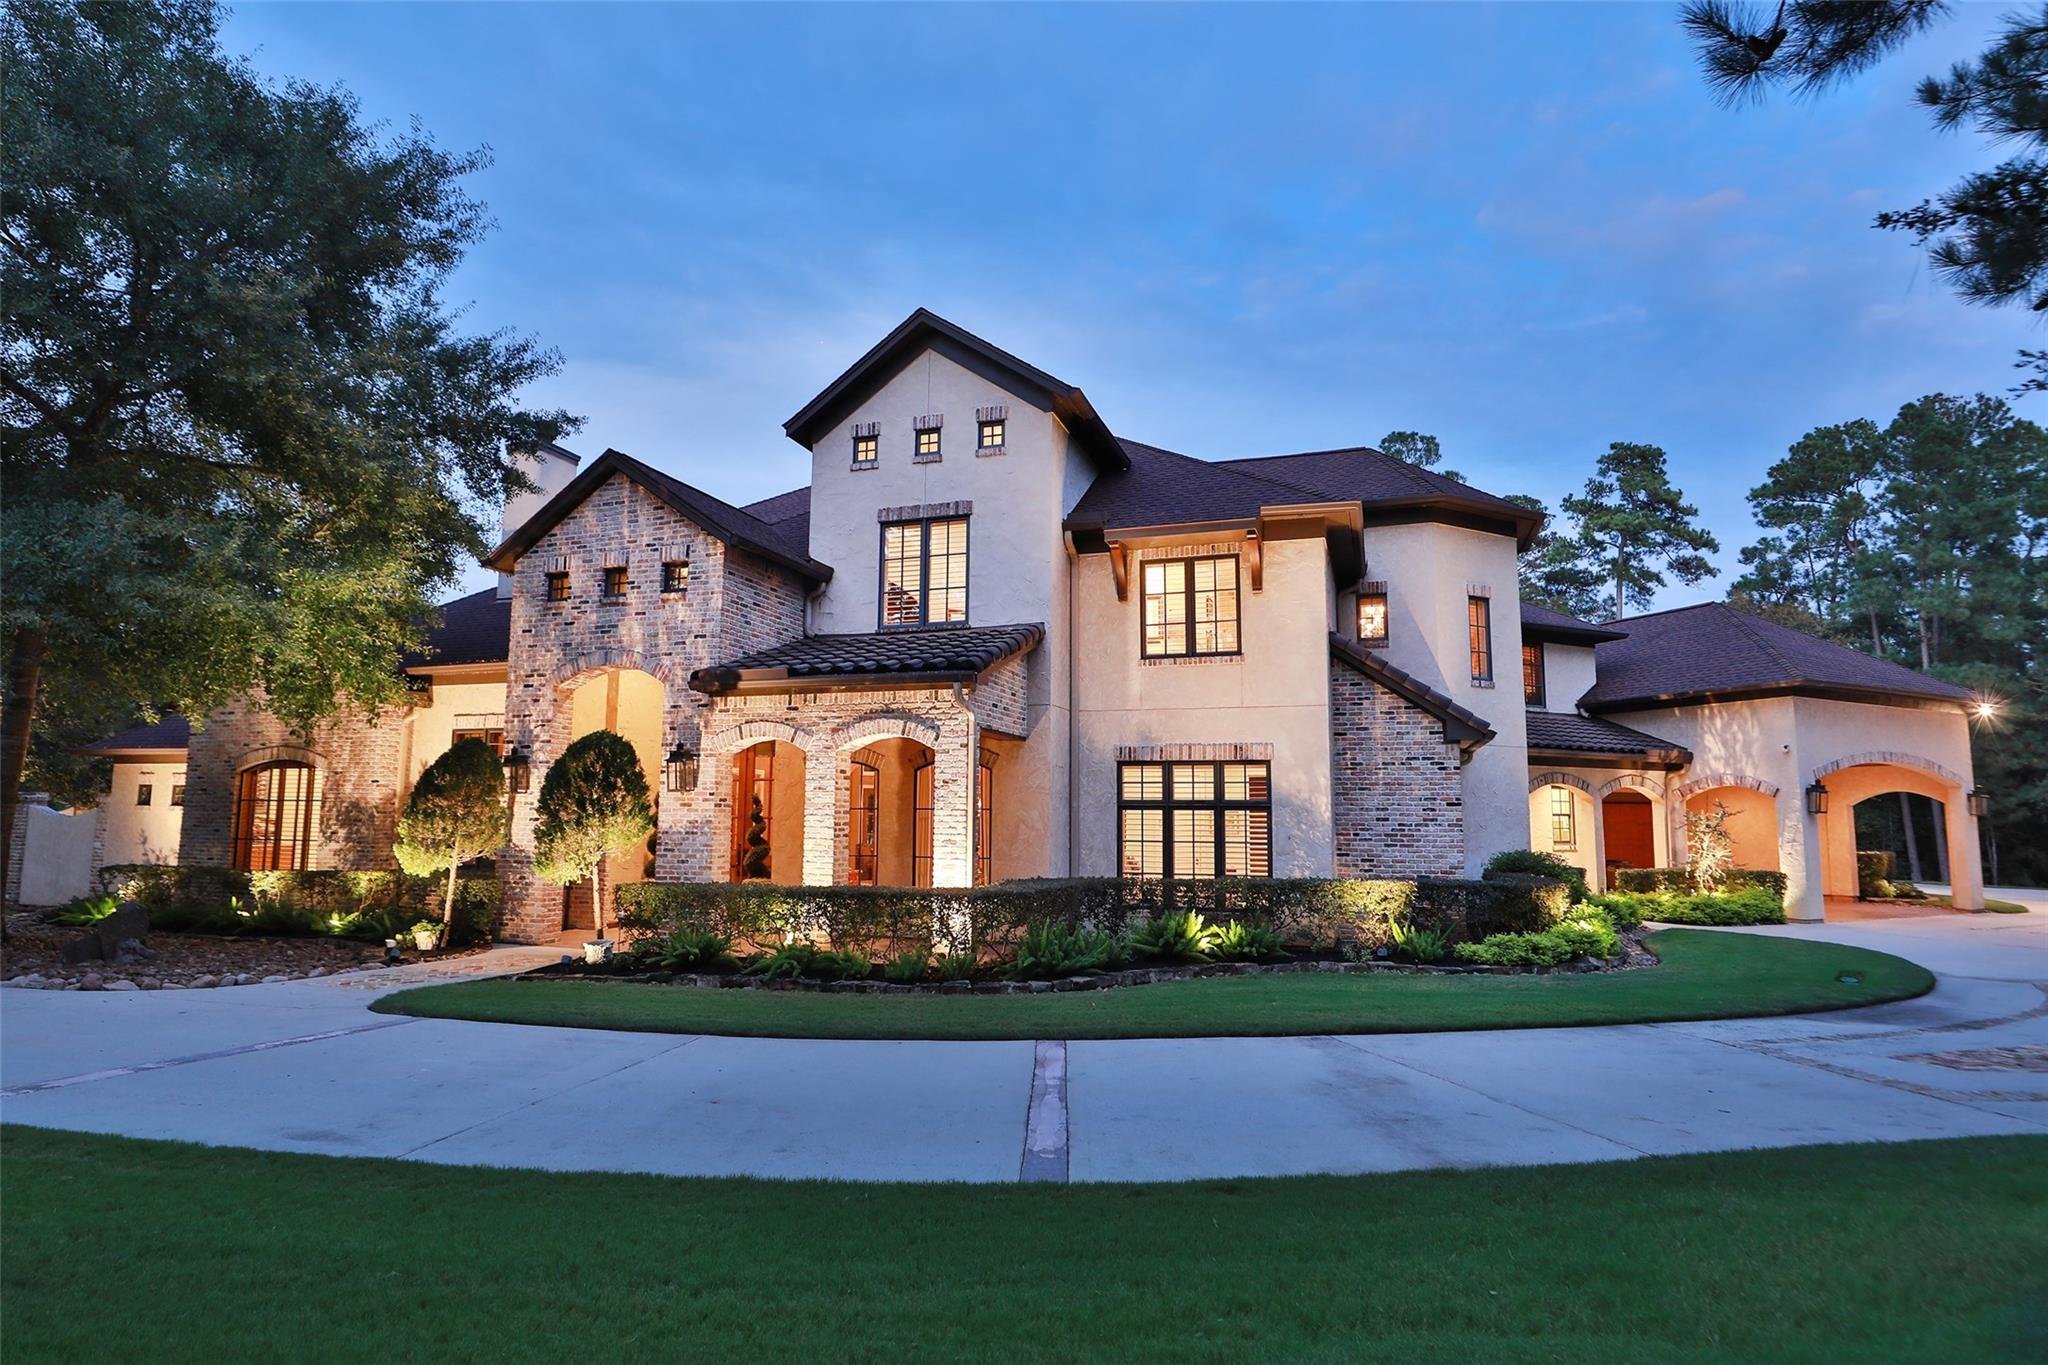 28222 Meadow Falls Property Photo - Magnolia, TX real estate listing